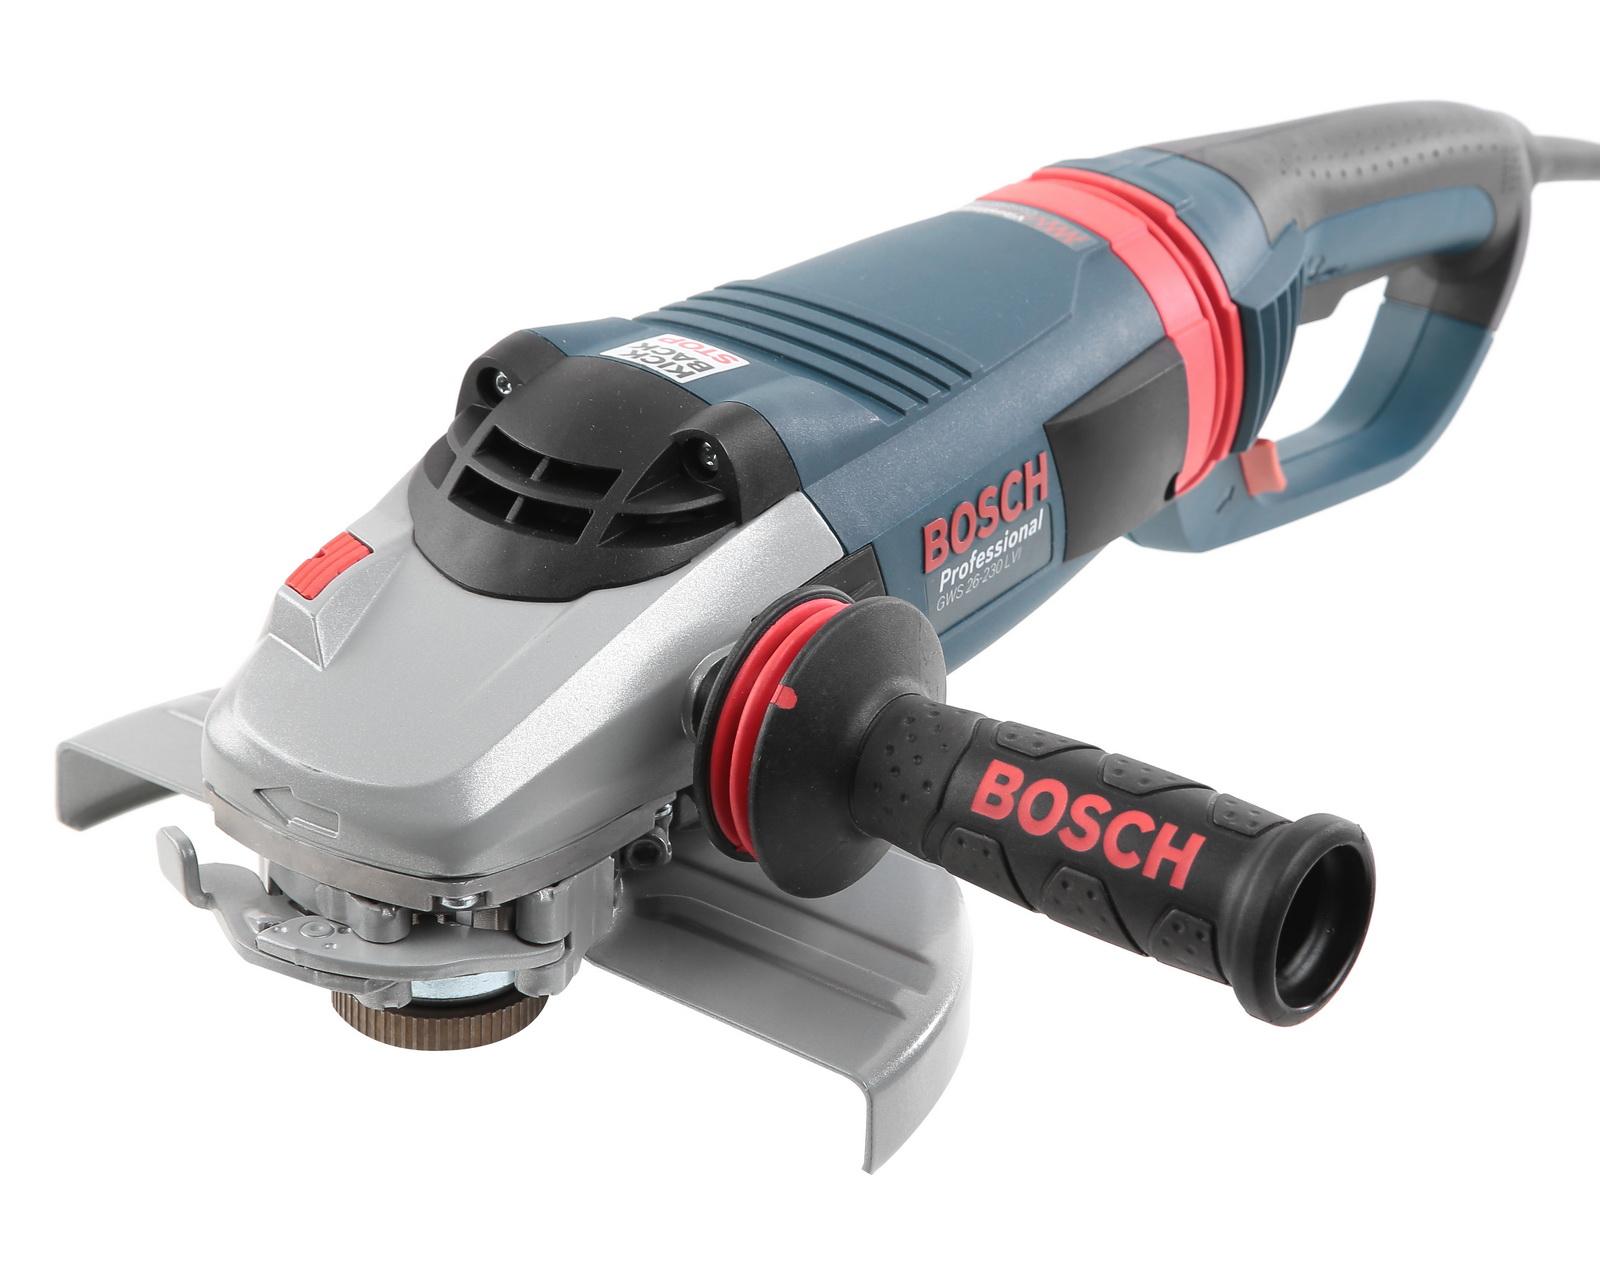 УШМ (болгарка) Bosch Gws 26-230 lvi (0.601.895.f04) угловая шлифмашина bosch gws 26 230 lvi 0 601 895 f04